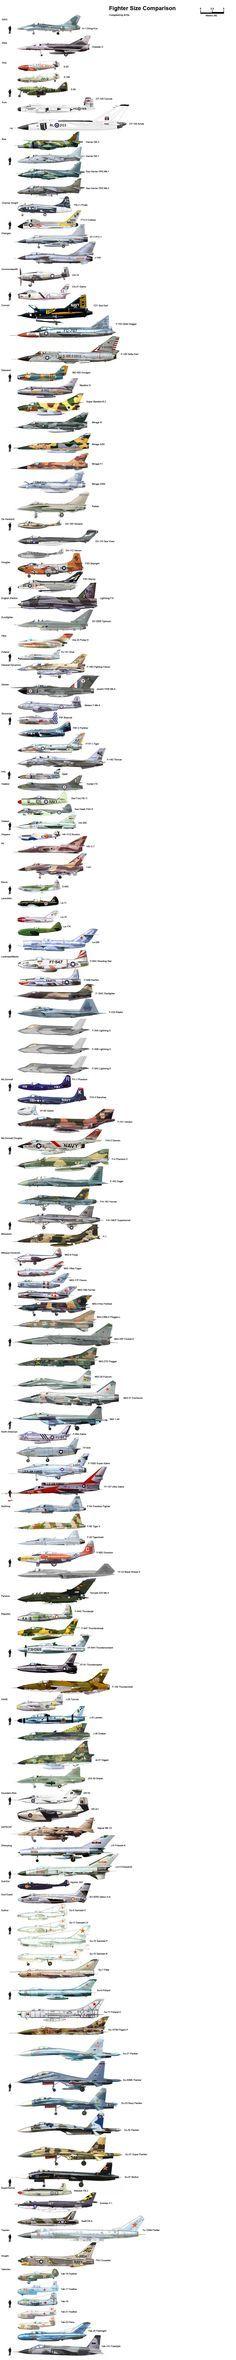 Plane Scales